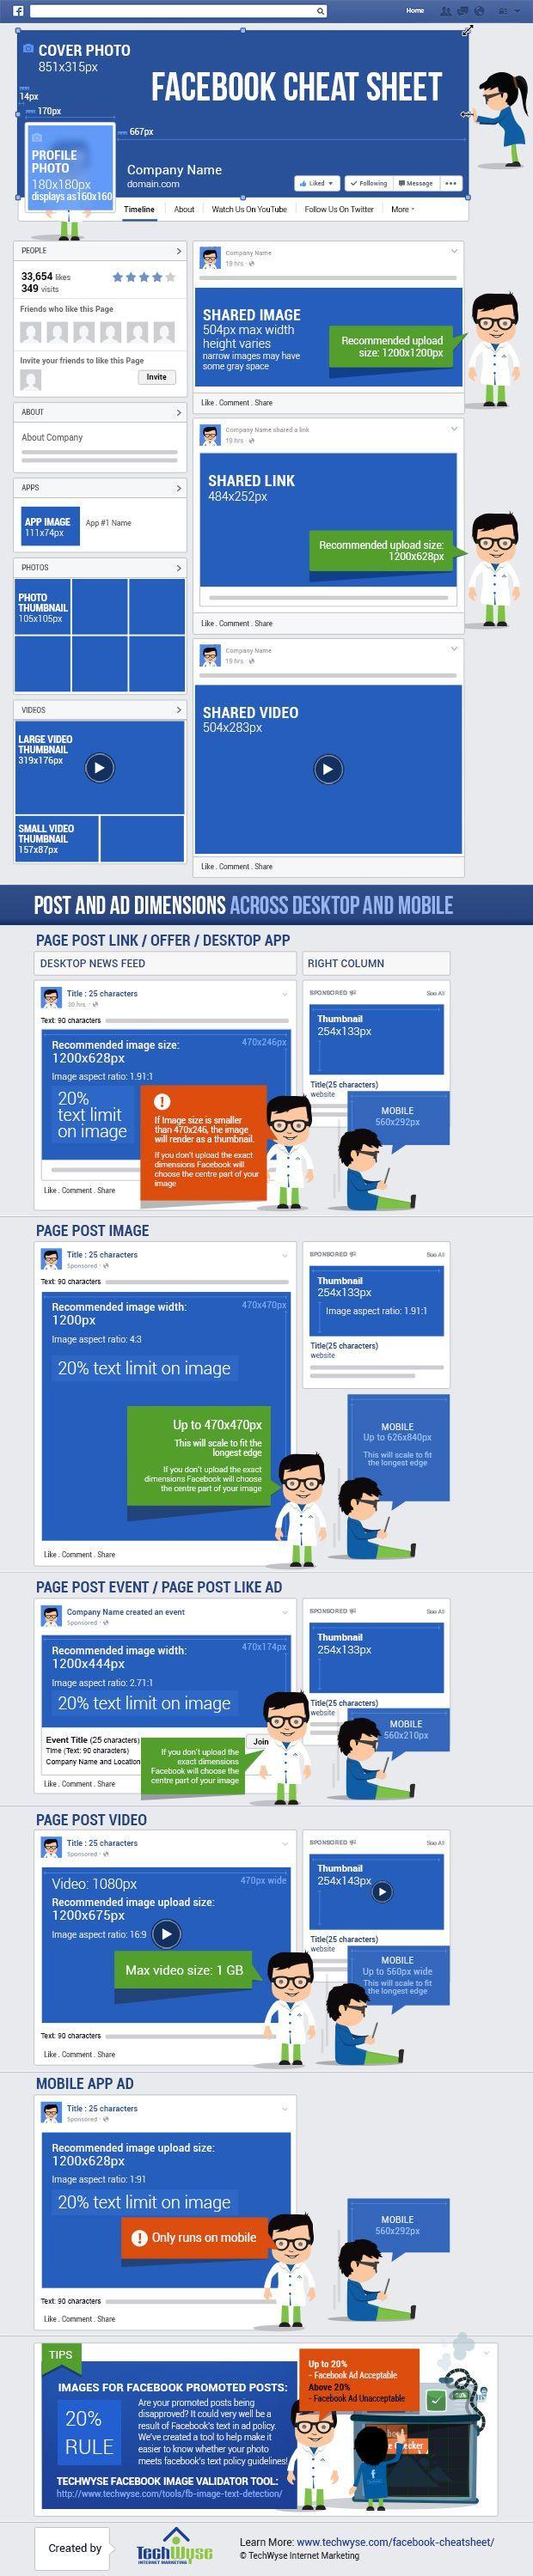 Top 20 Facebook Statistics - Updated April 2019